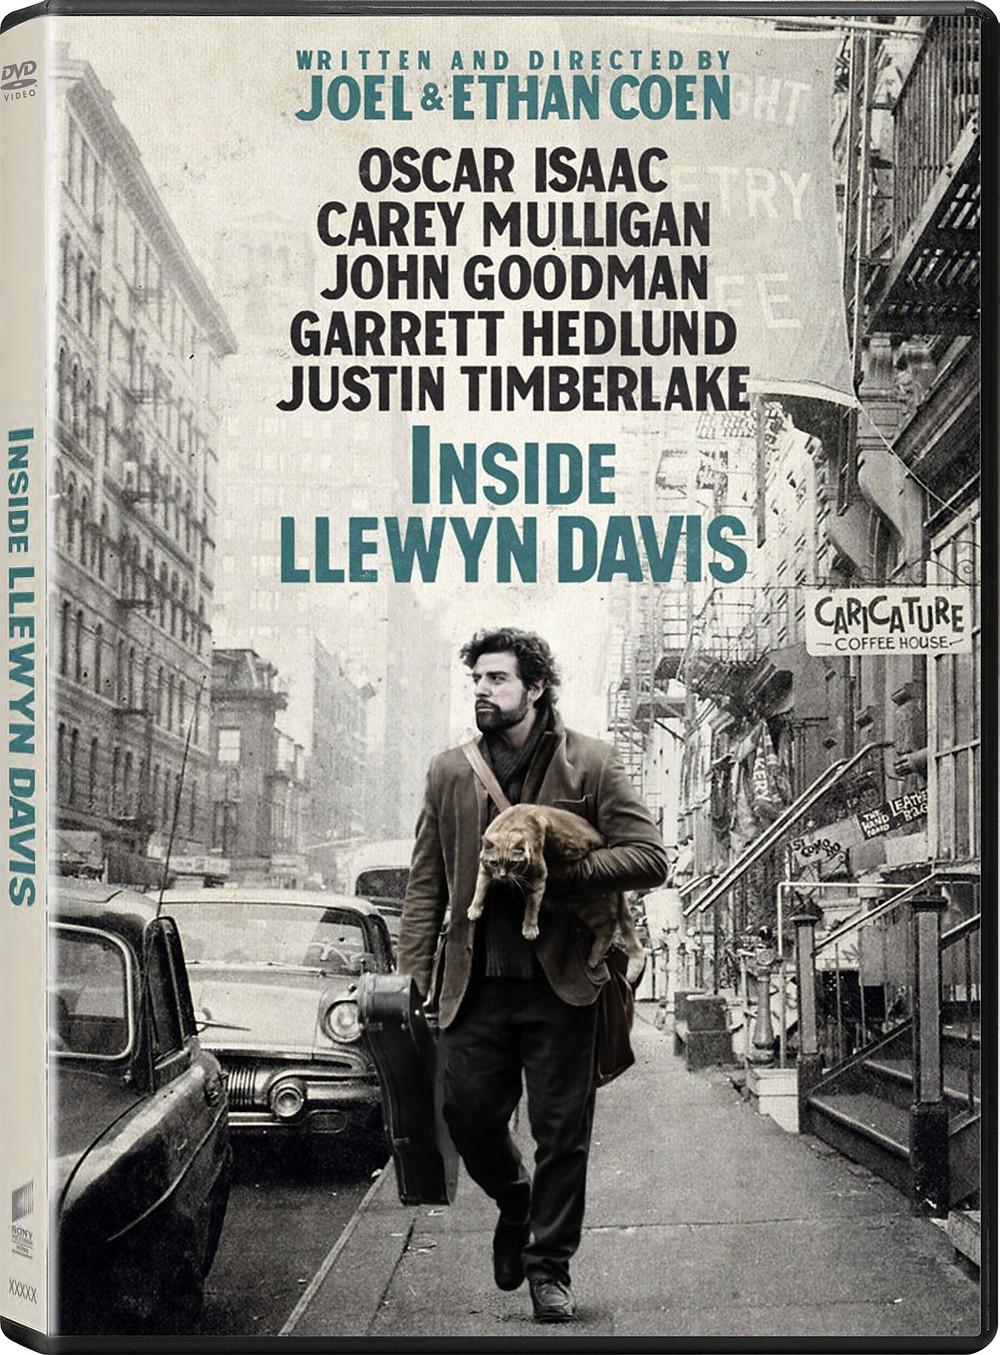 inside-llewyn-davis-dvd-cover-21.jpg